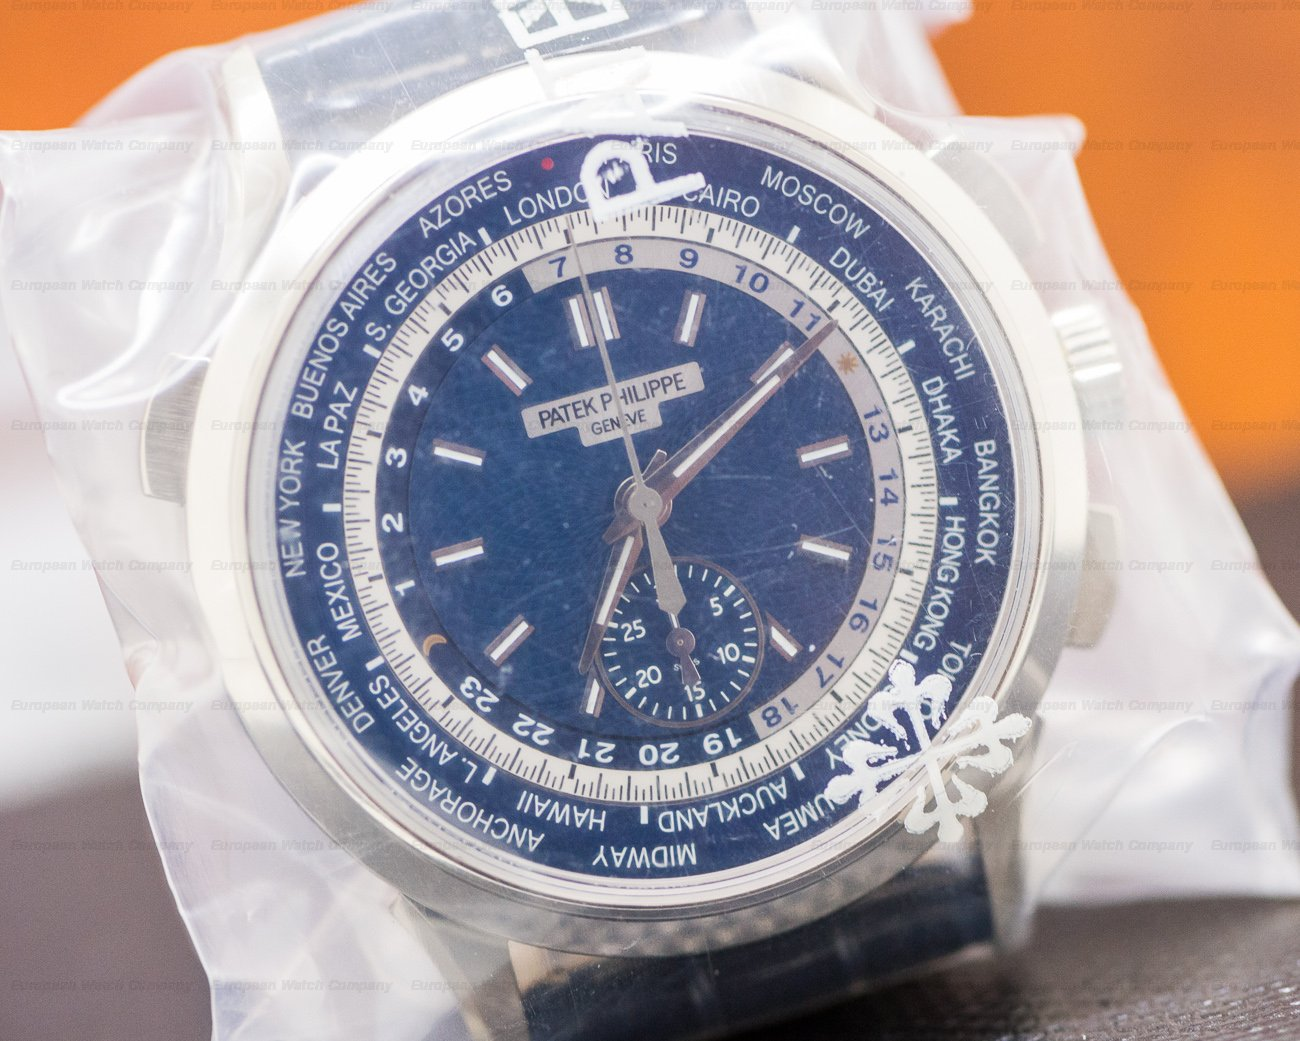 Patek Philippe 5930G-001 World Time Chronograph 18k White Gold UNWORN & SEALED